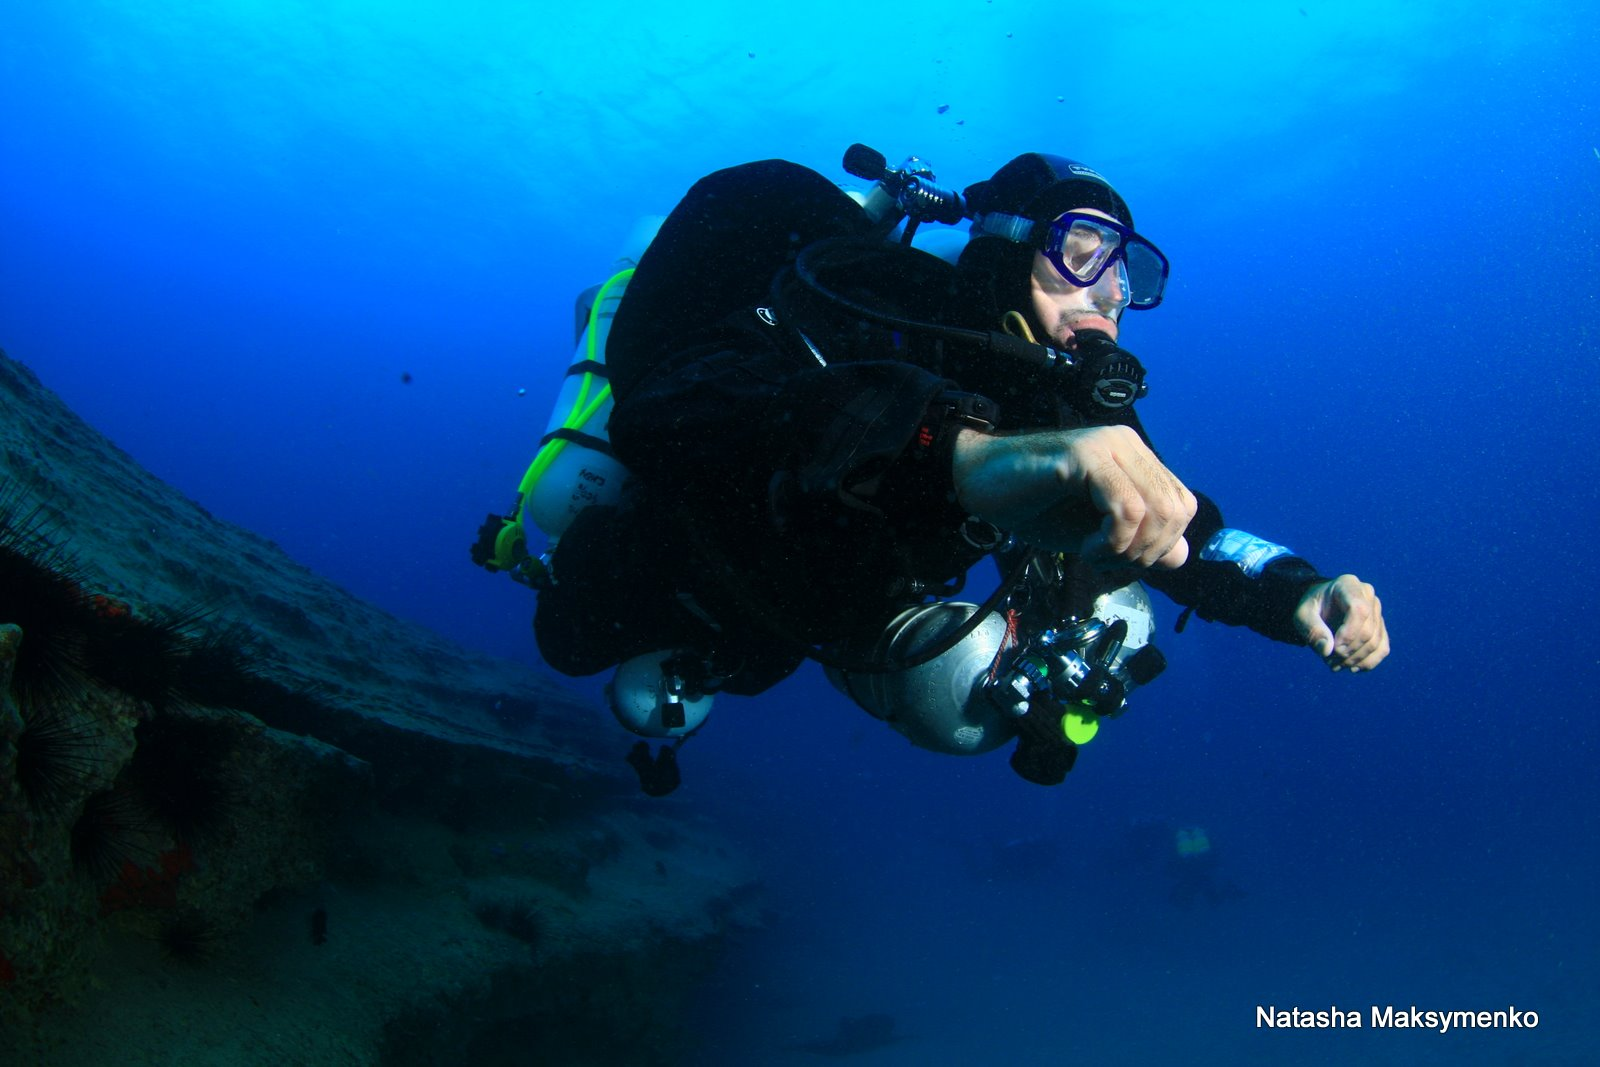 buceo con rebreather - victor